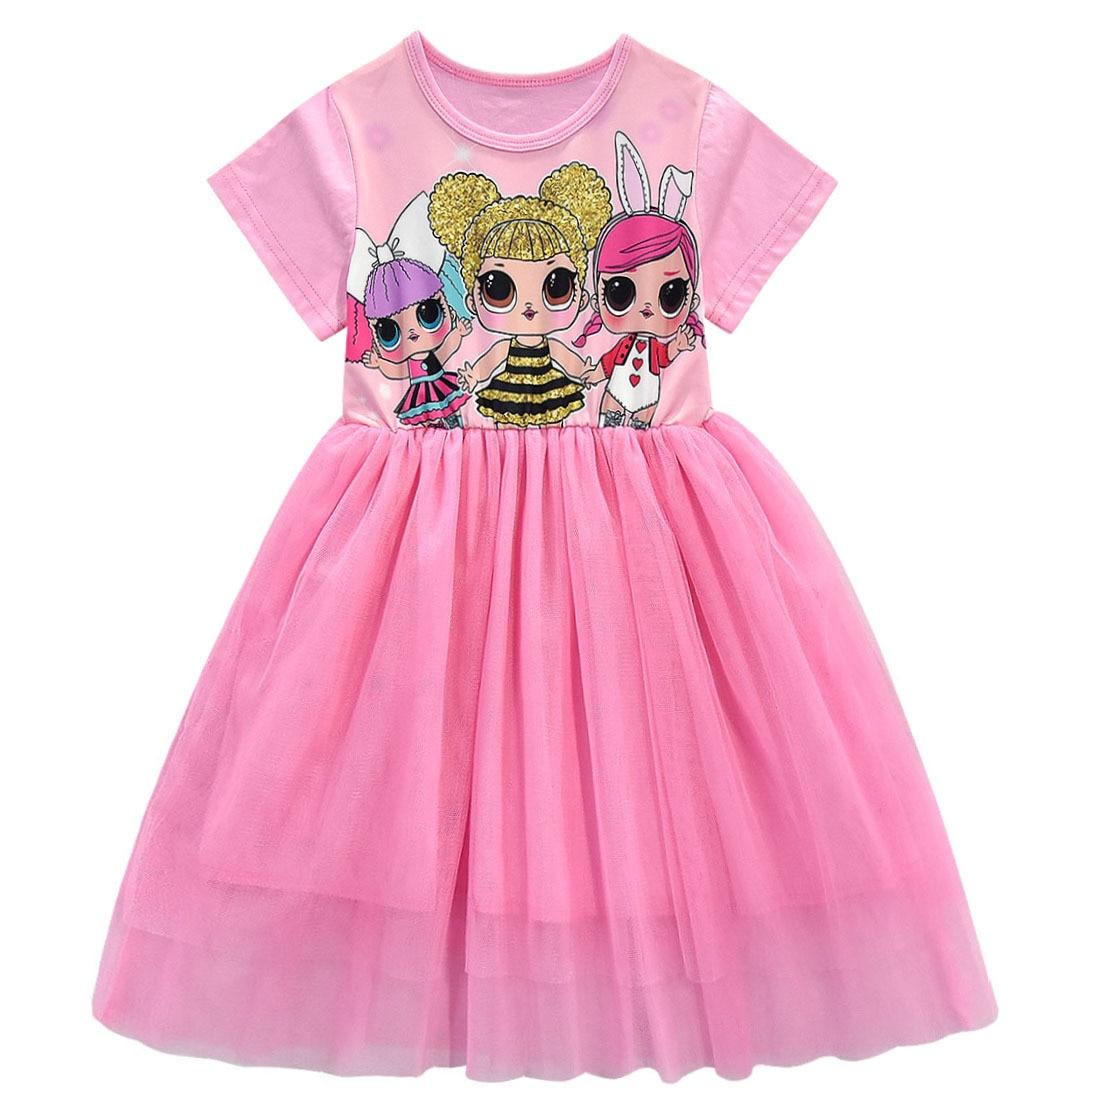 Girls Lol Dress Toddler Baby Lol Doll Clothes Kids Cartoon Print Princess Dress Children Short Sleeve Birthday Vestido for Girl 3